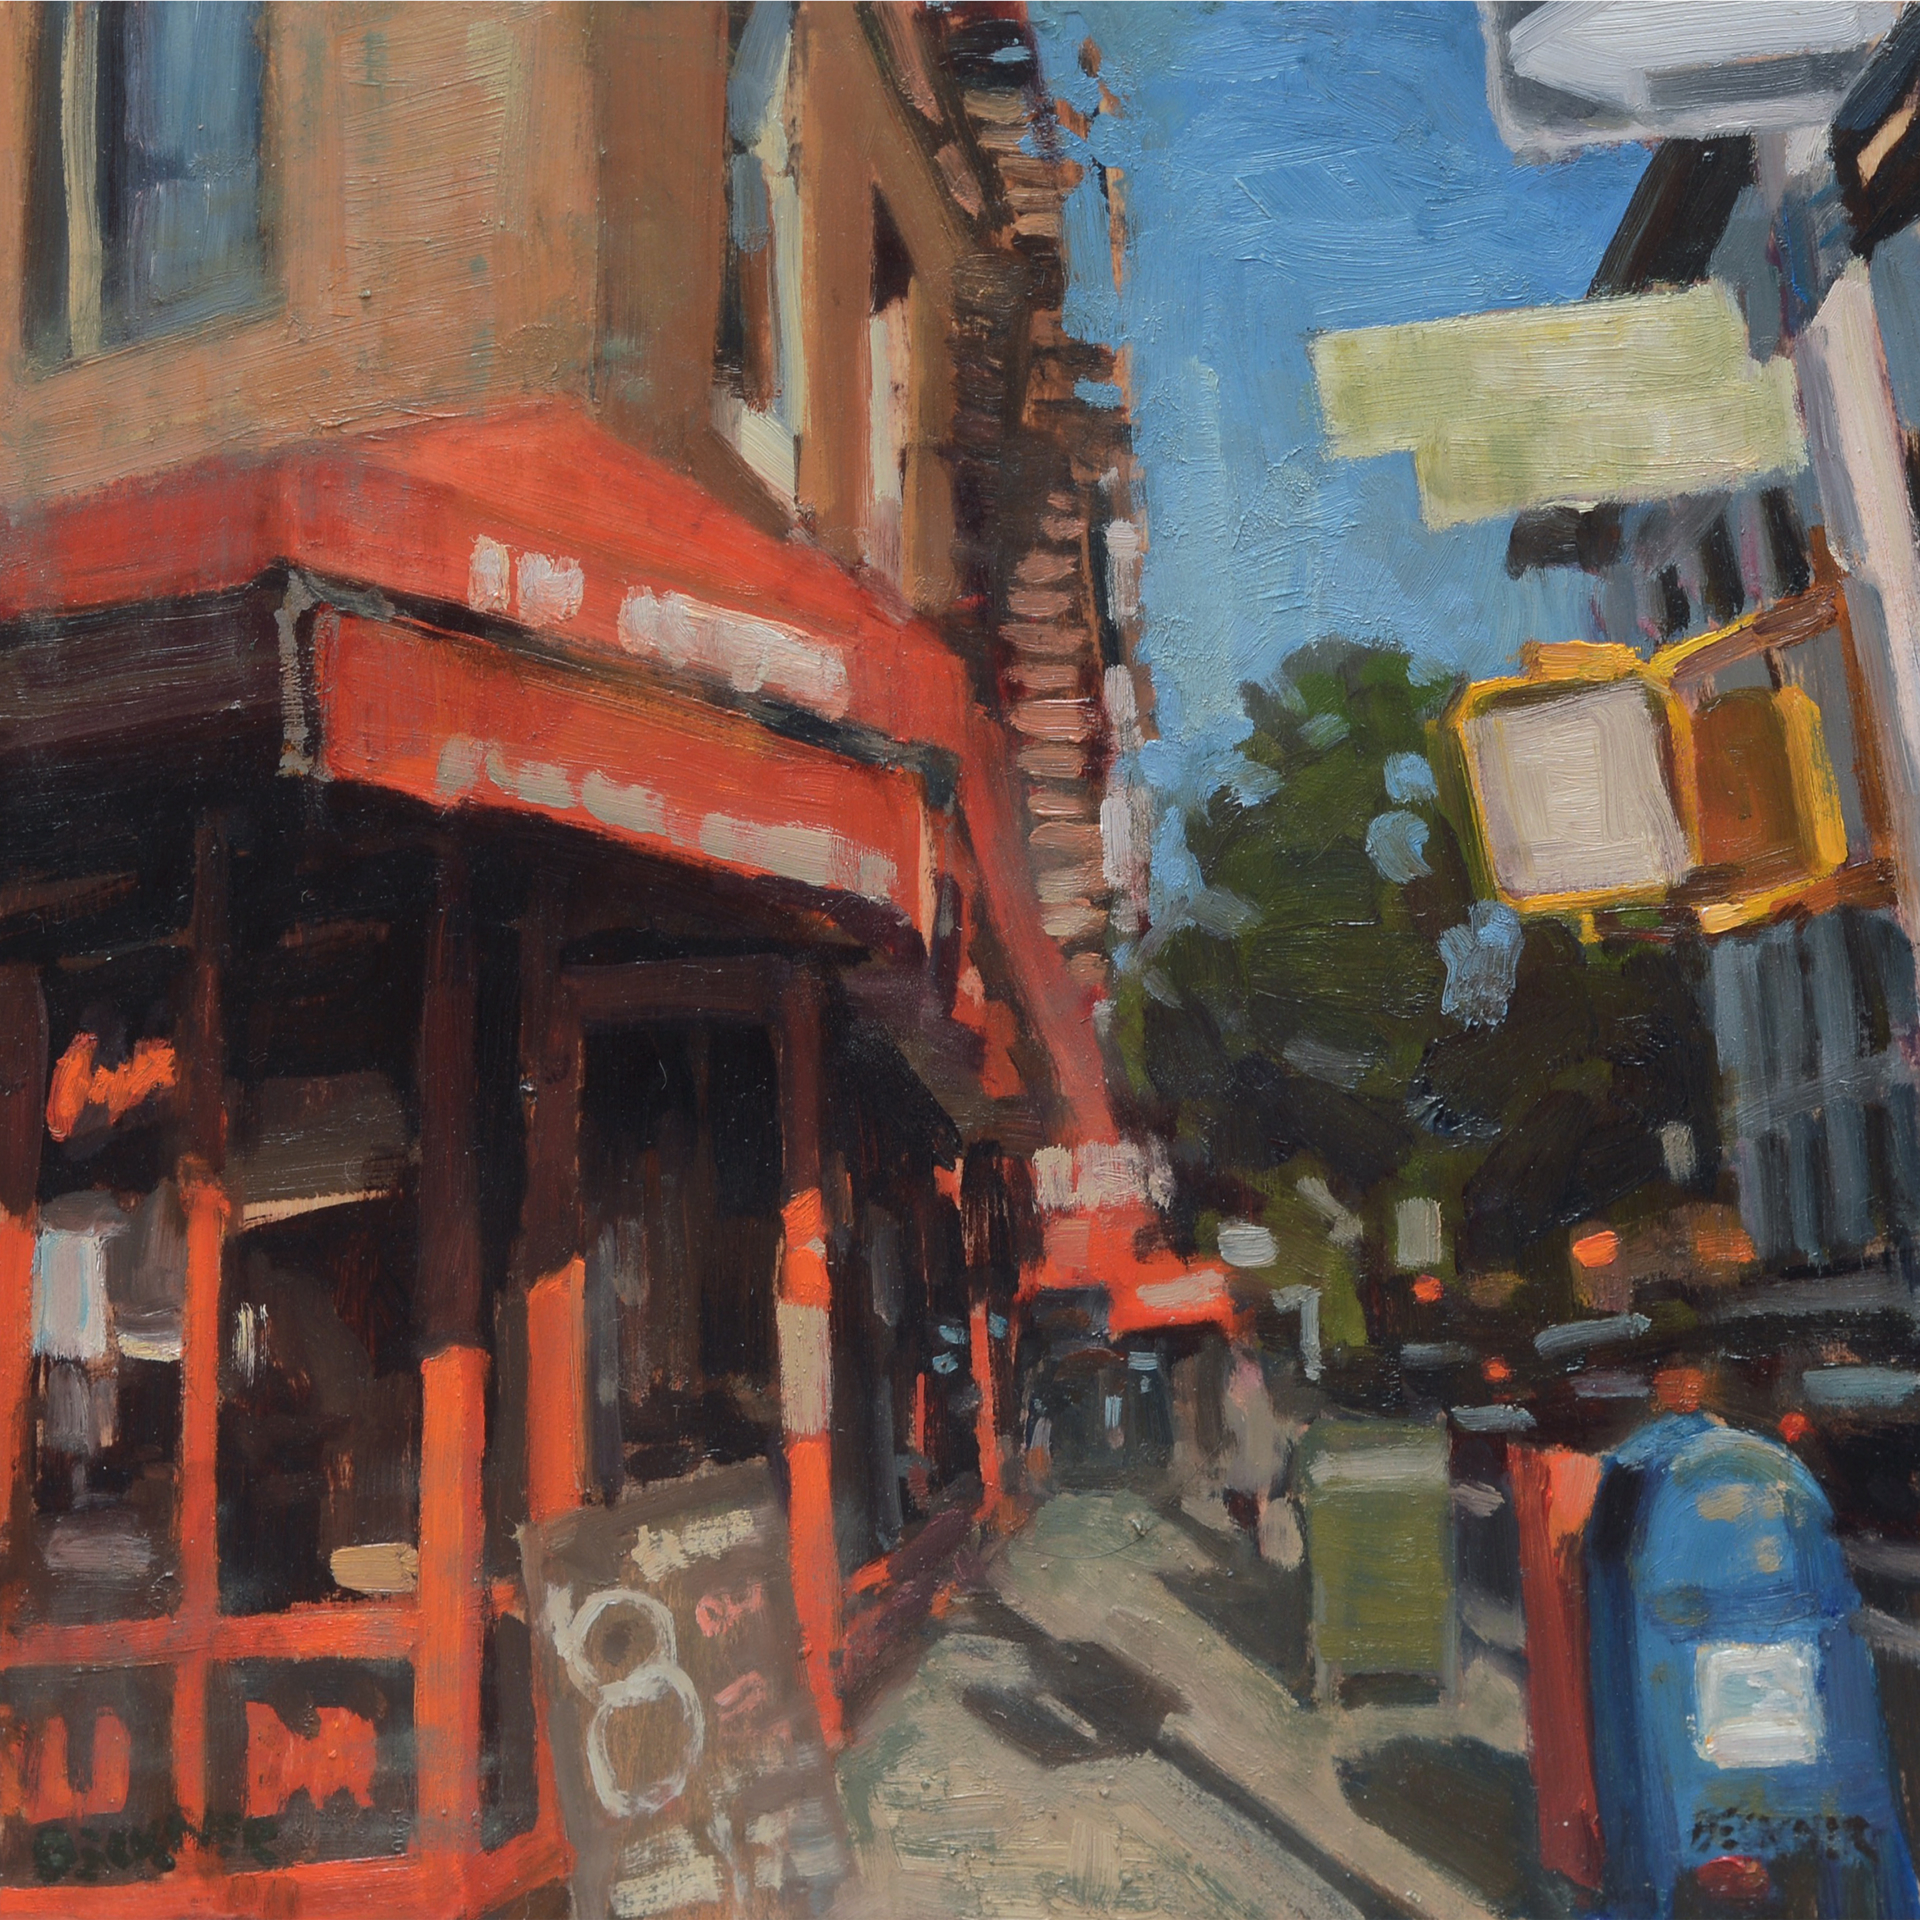 Urban Sunset #2 by Jim Beckner